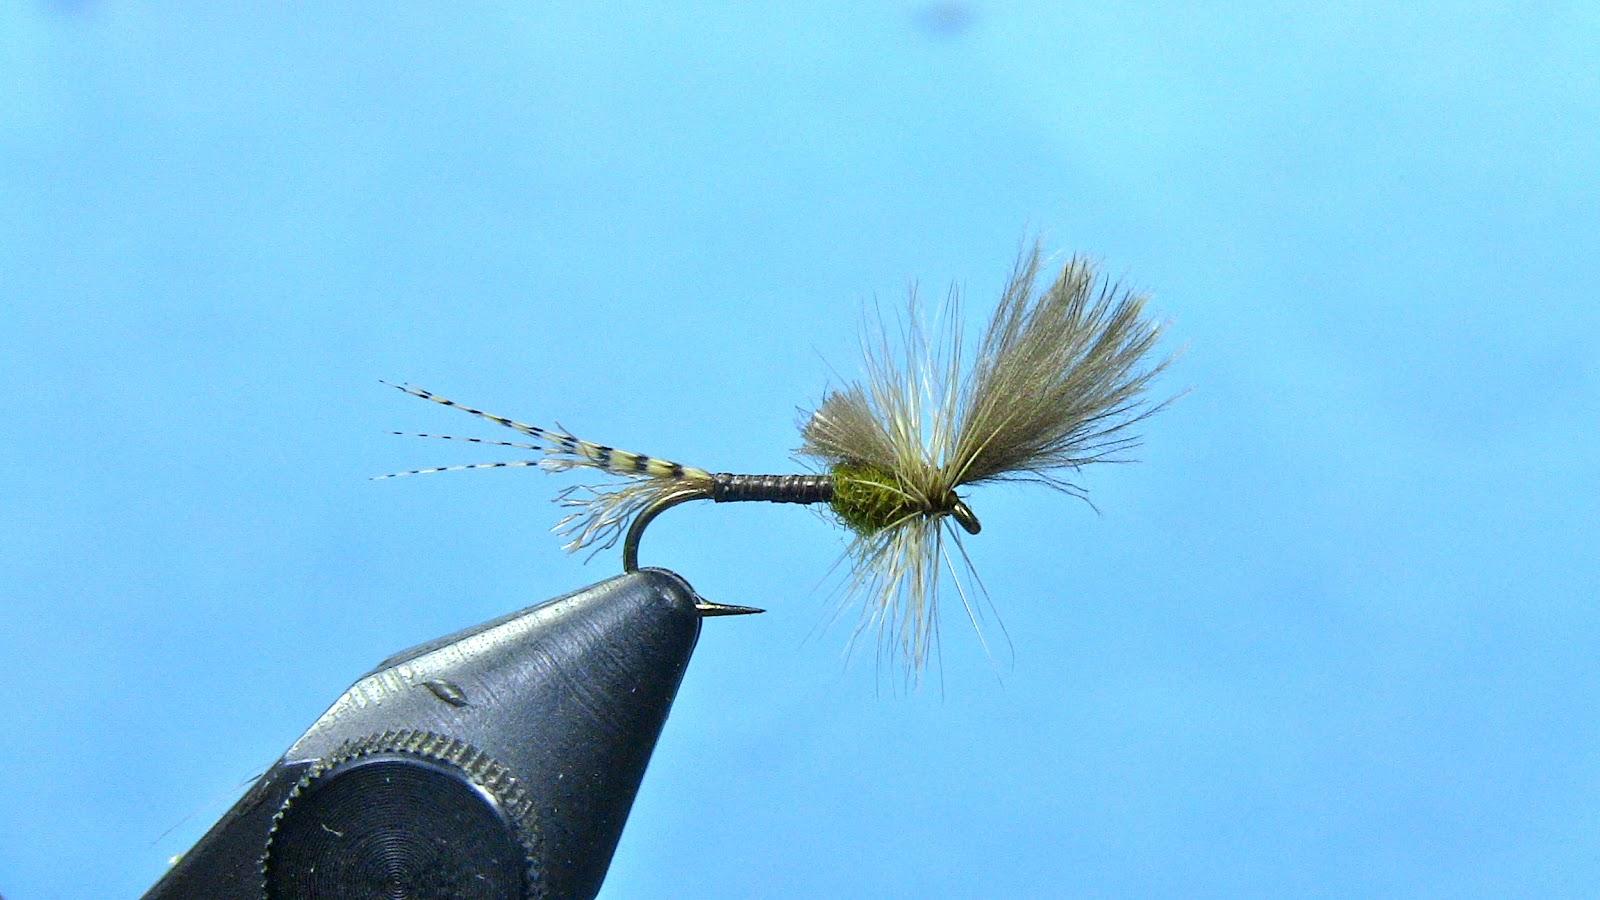 Black hills fly fishing tying the last chance cripple for Black hills fly fishing